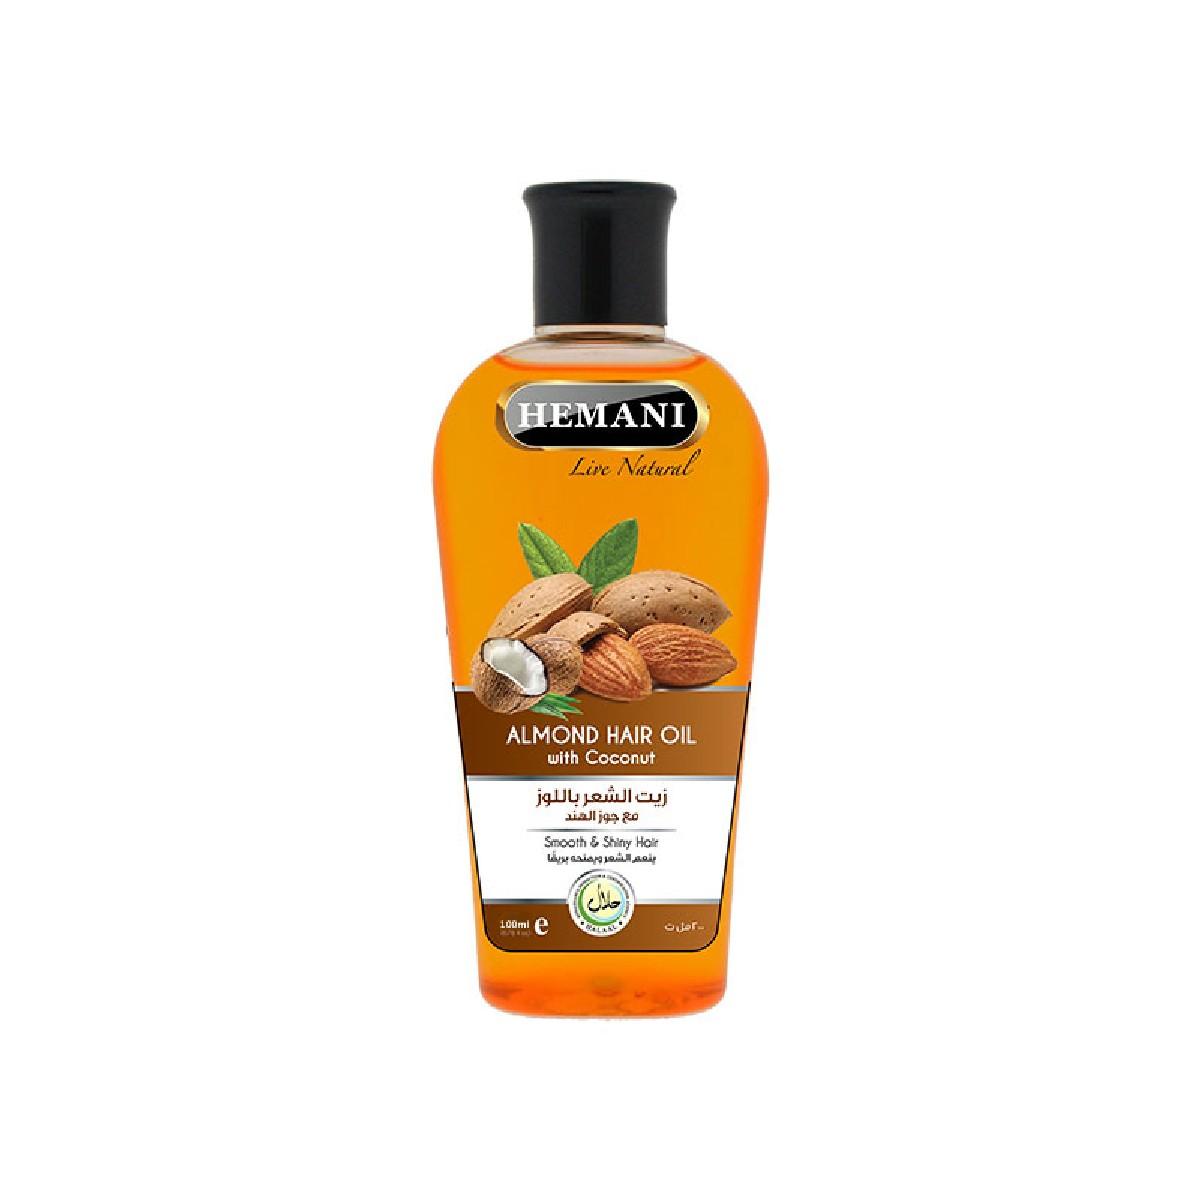 Hemani Almond Hair Oil 100ml